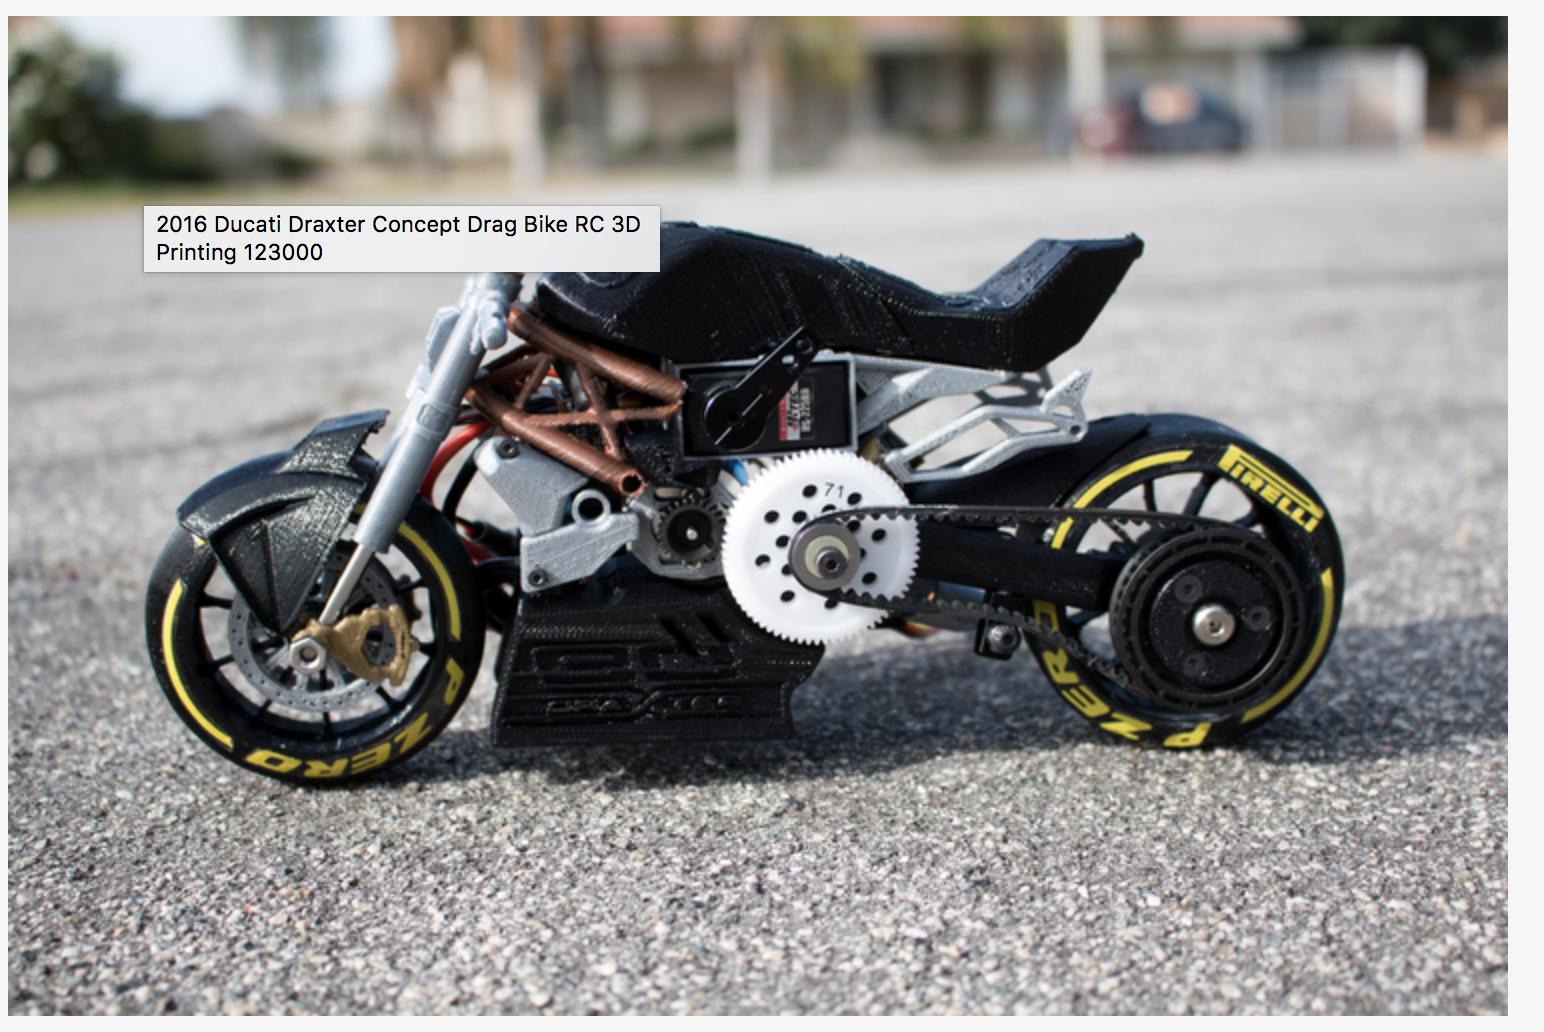 Screen Shot 2017-02-10 at 9.28.53 AM.png Download free STL file 2016 Ducati Draxter Concept Drag Bike RC • 3D printer template, brett